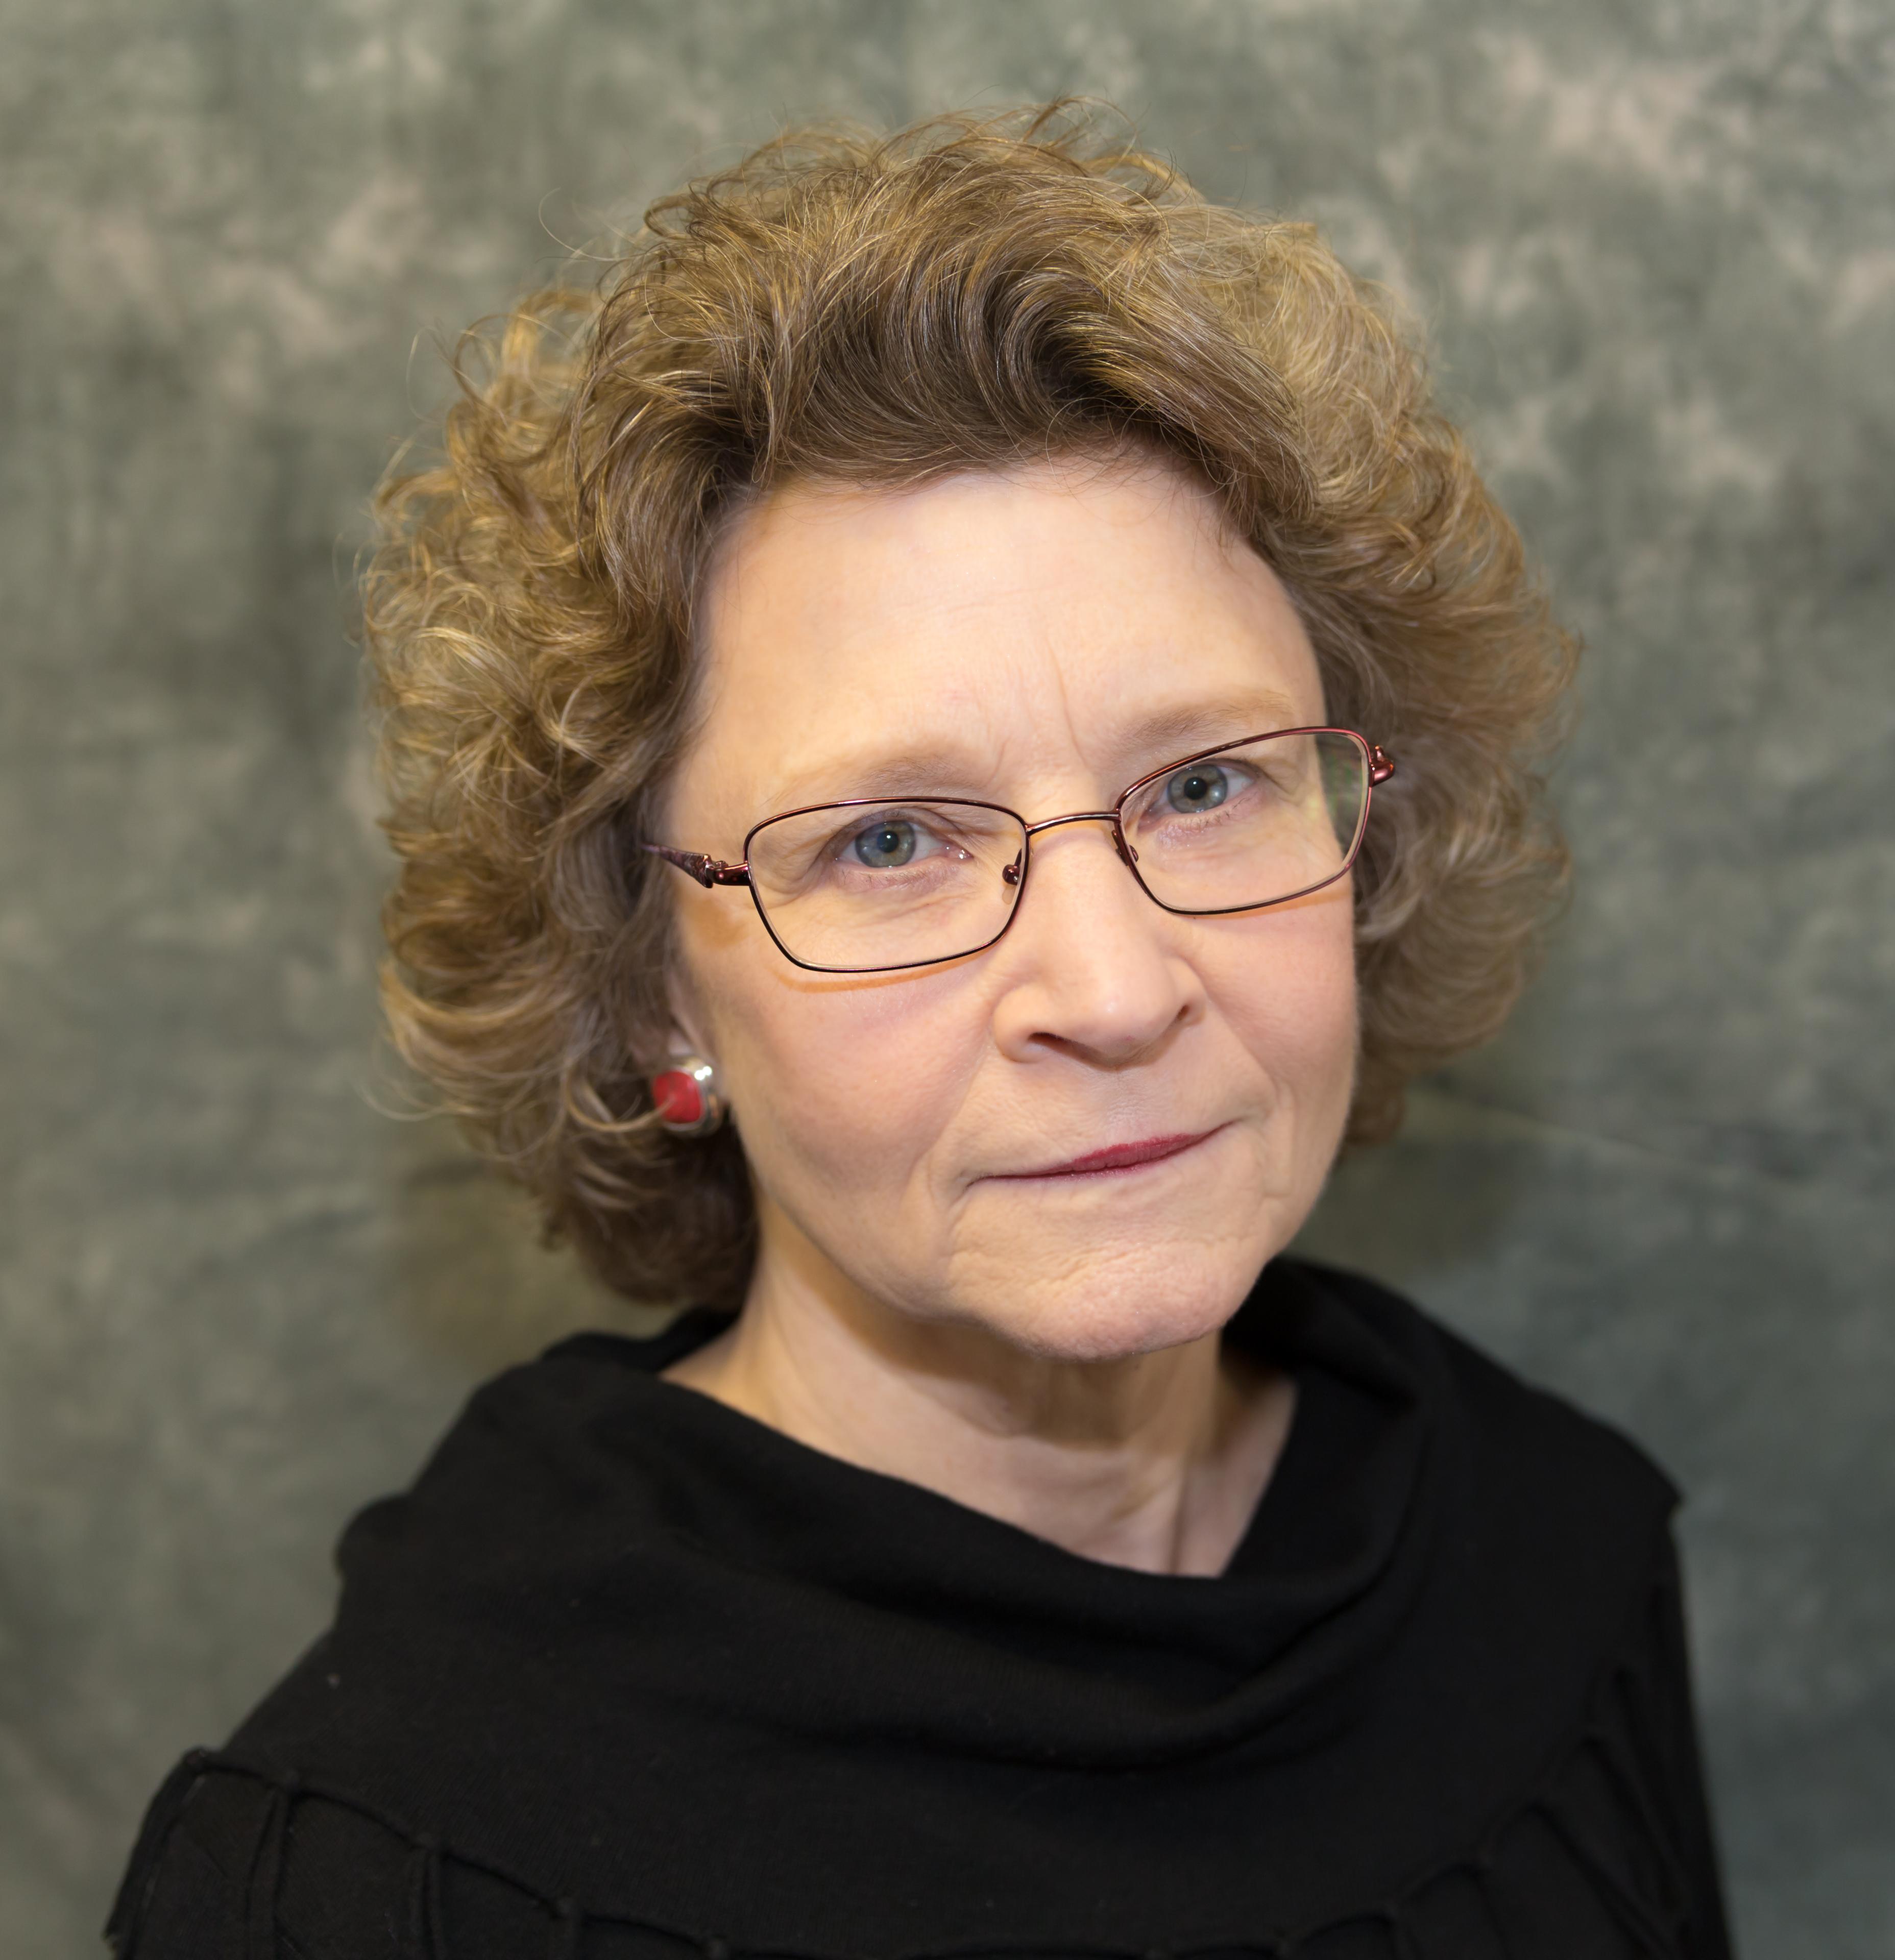 Marsha Molinari, MSW, LICSW